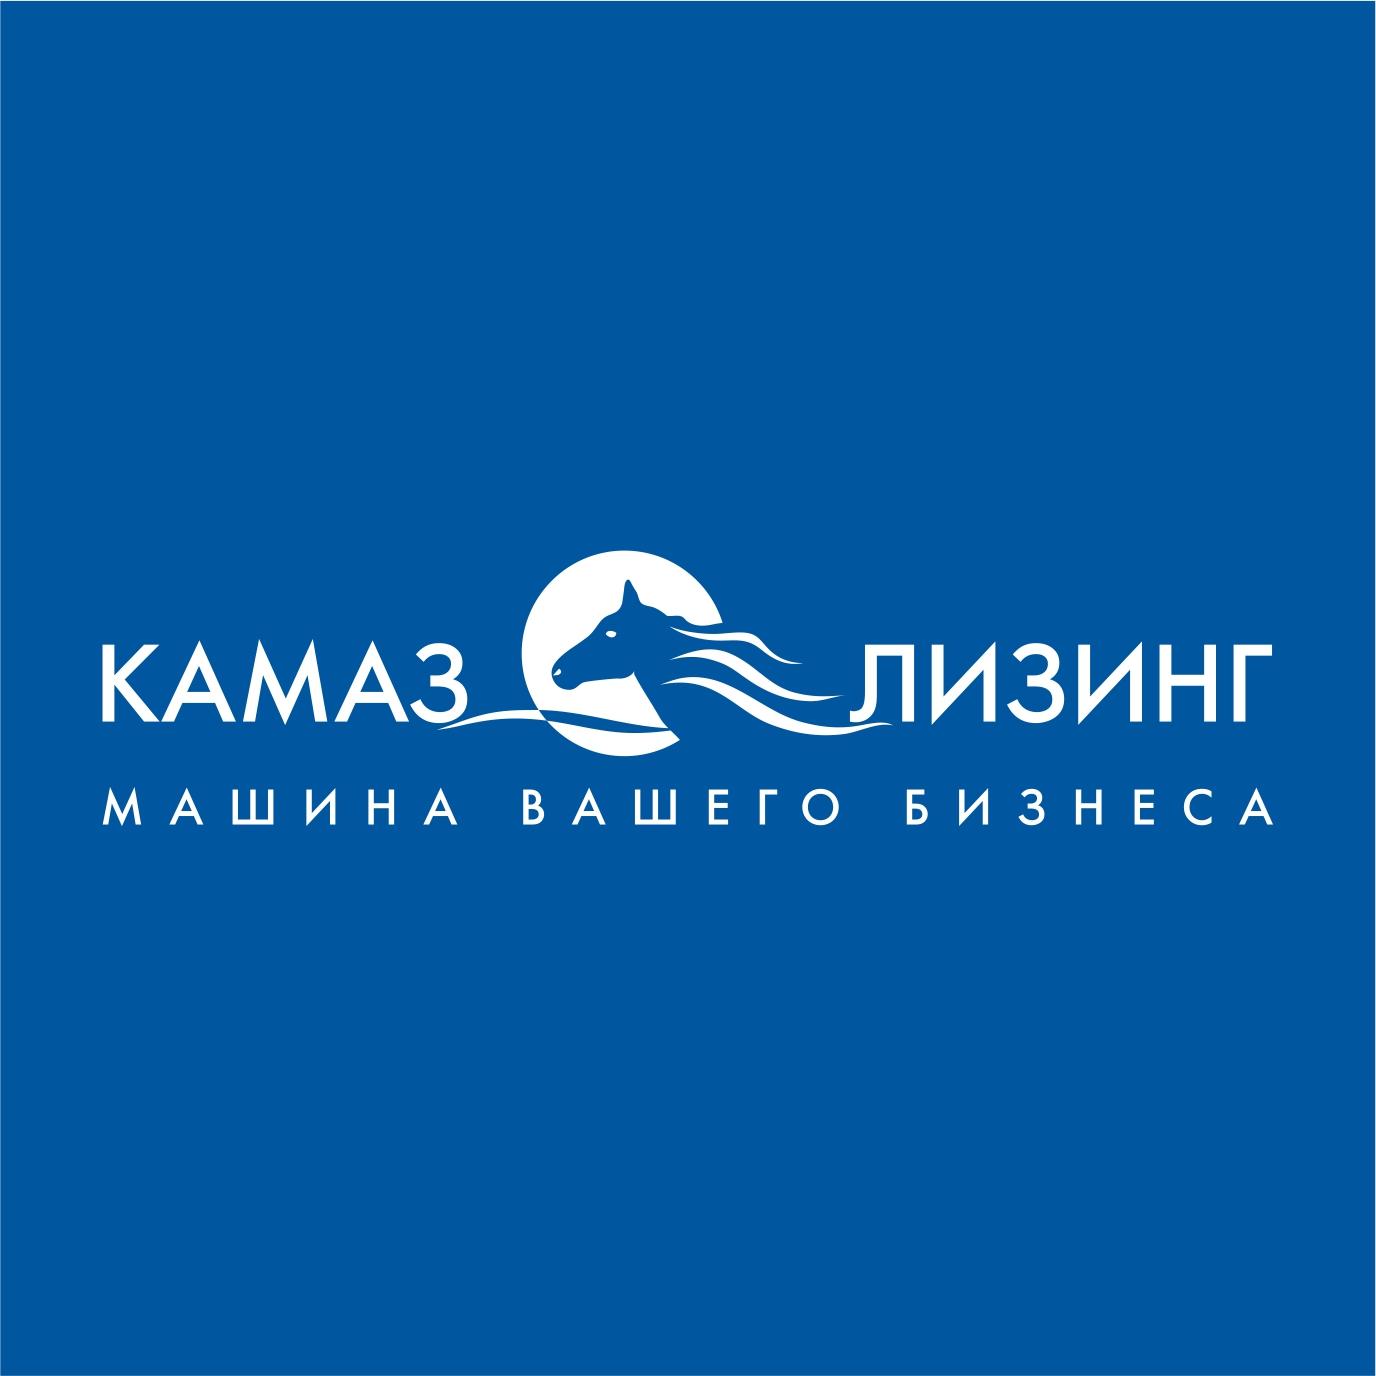 «КАМАЗ-ЛИЗИНГ» продолжает региональную экспансию